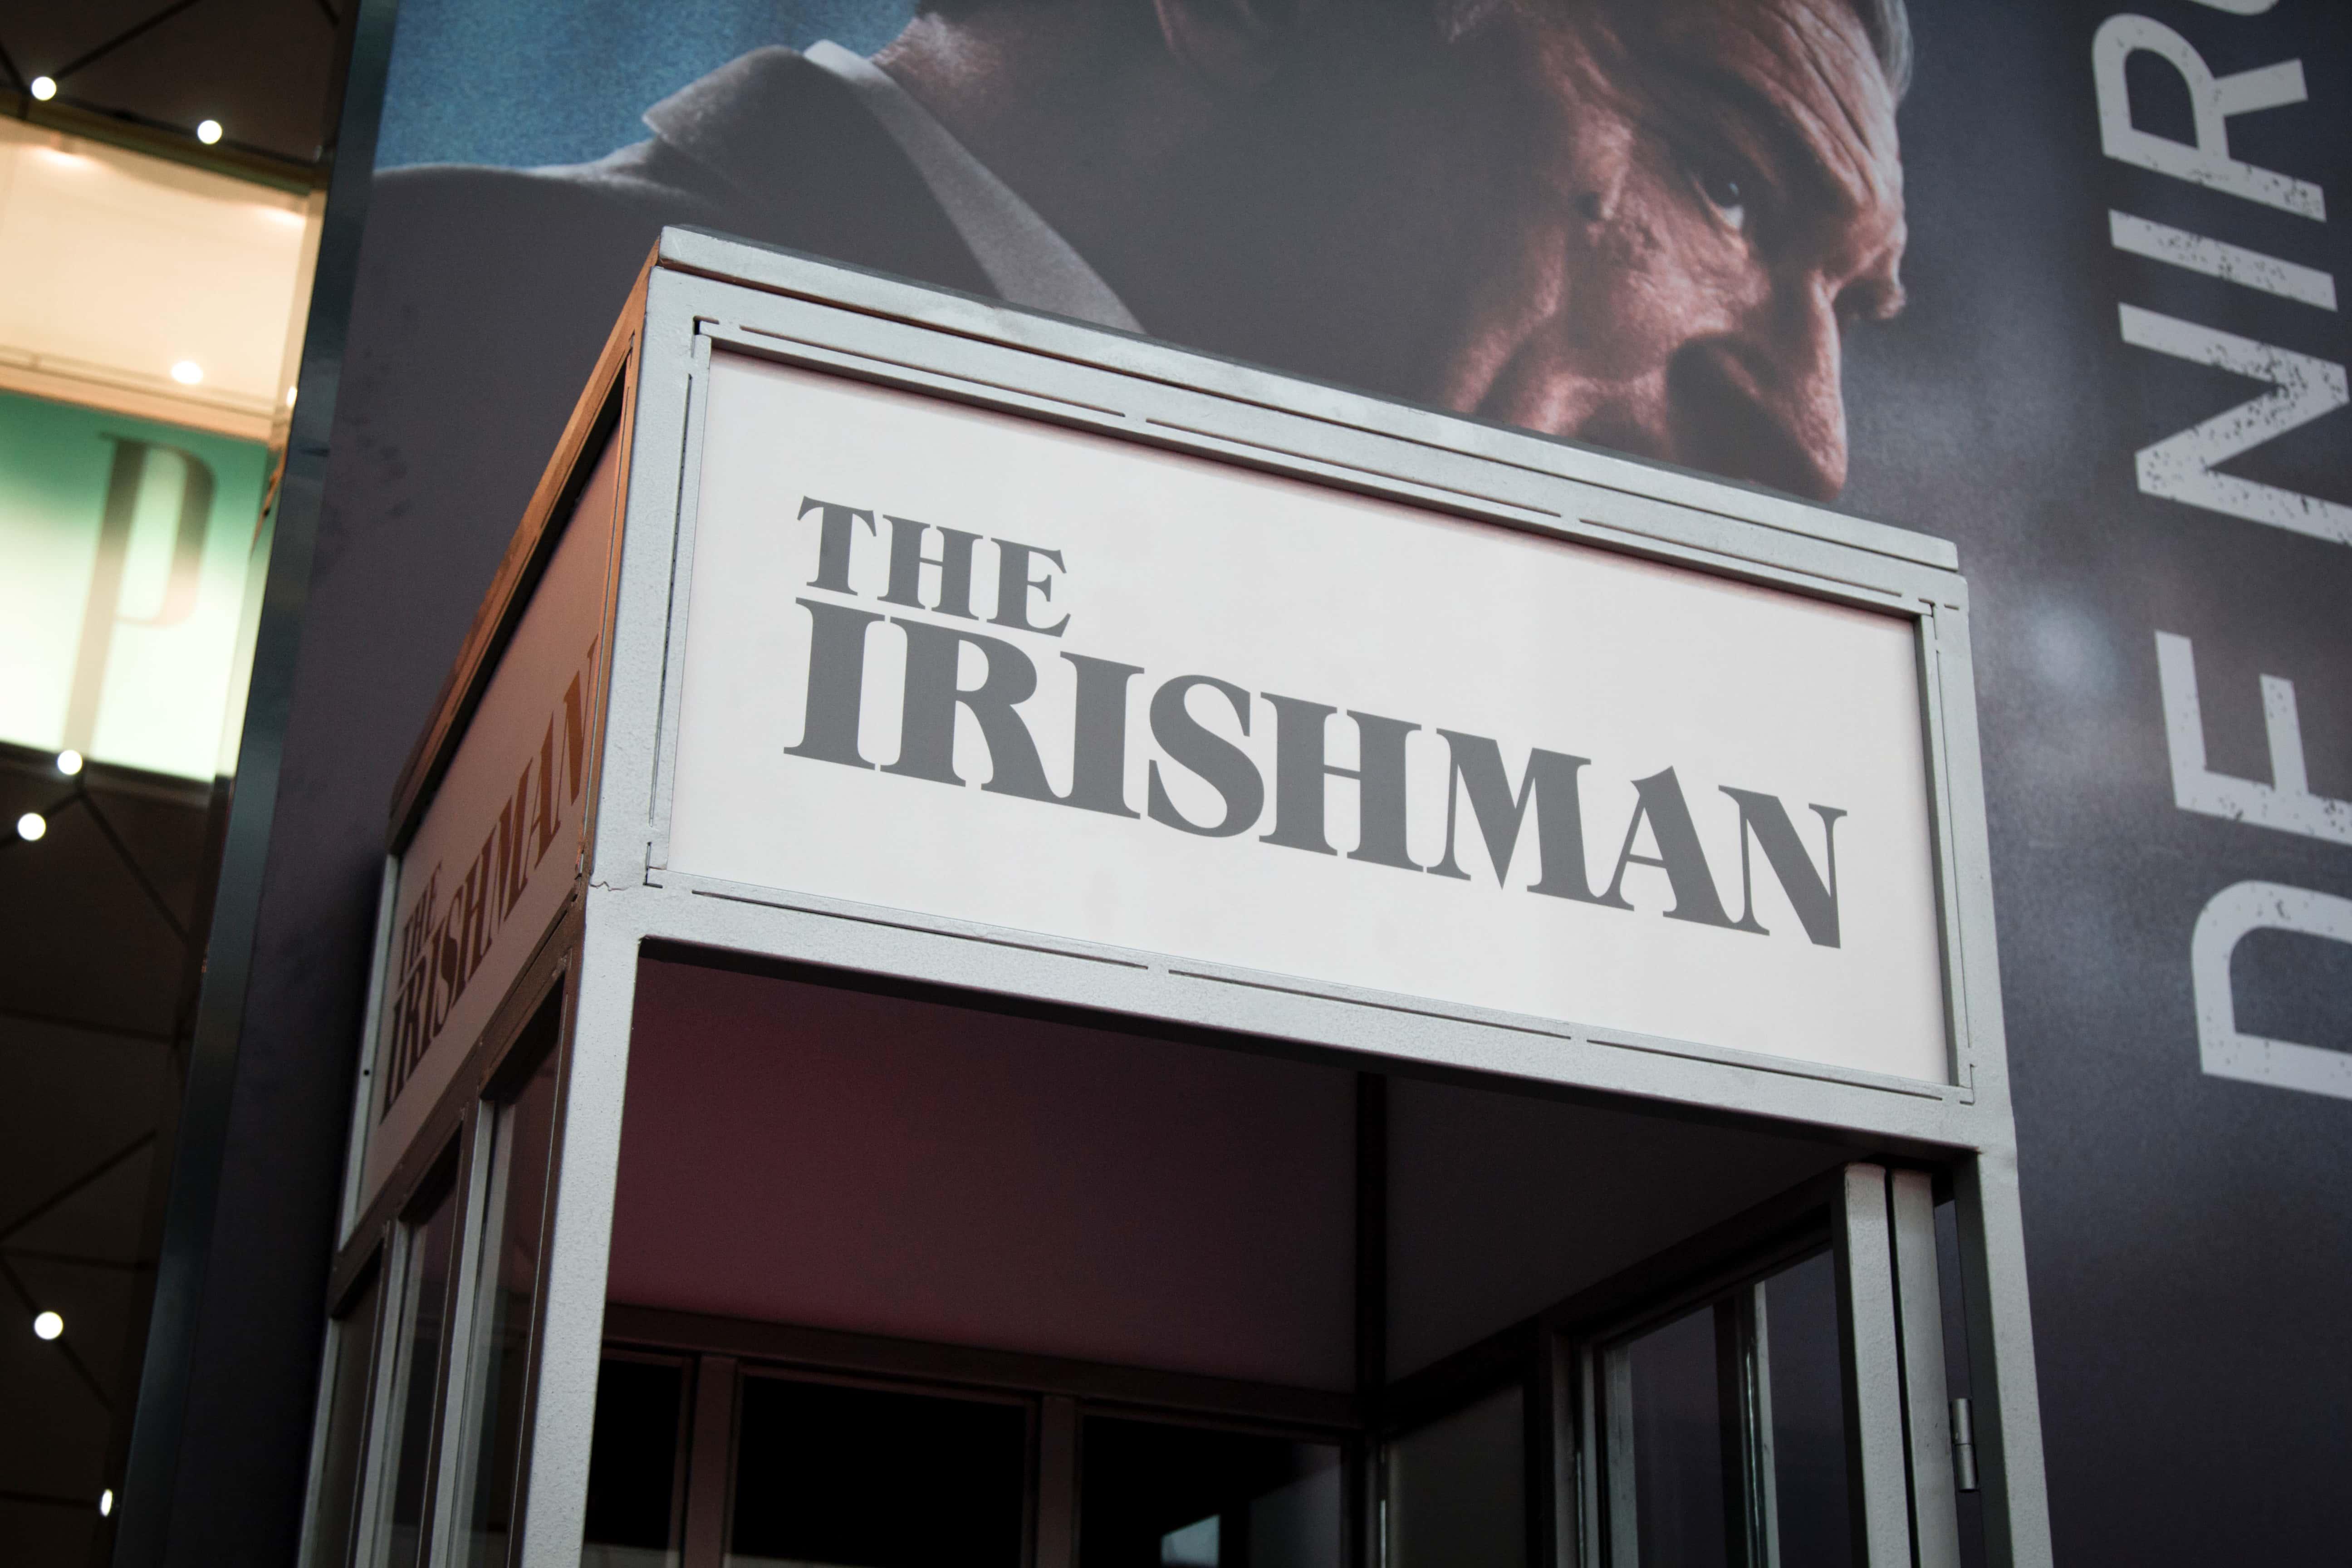 The Irishman facts